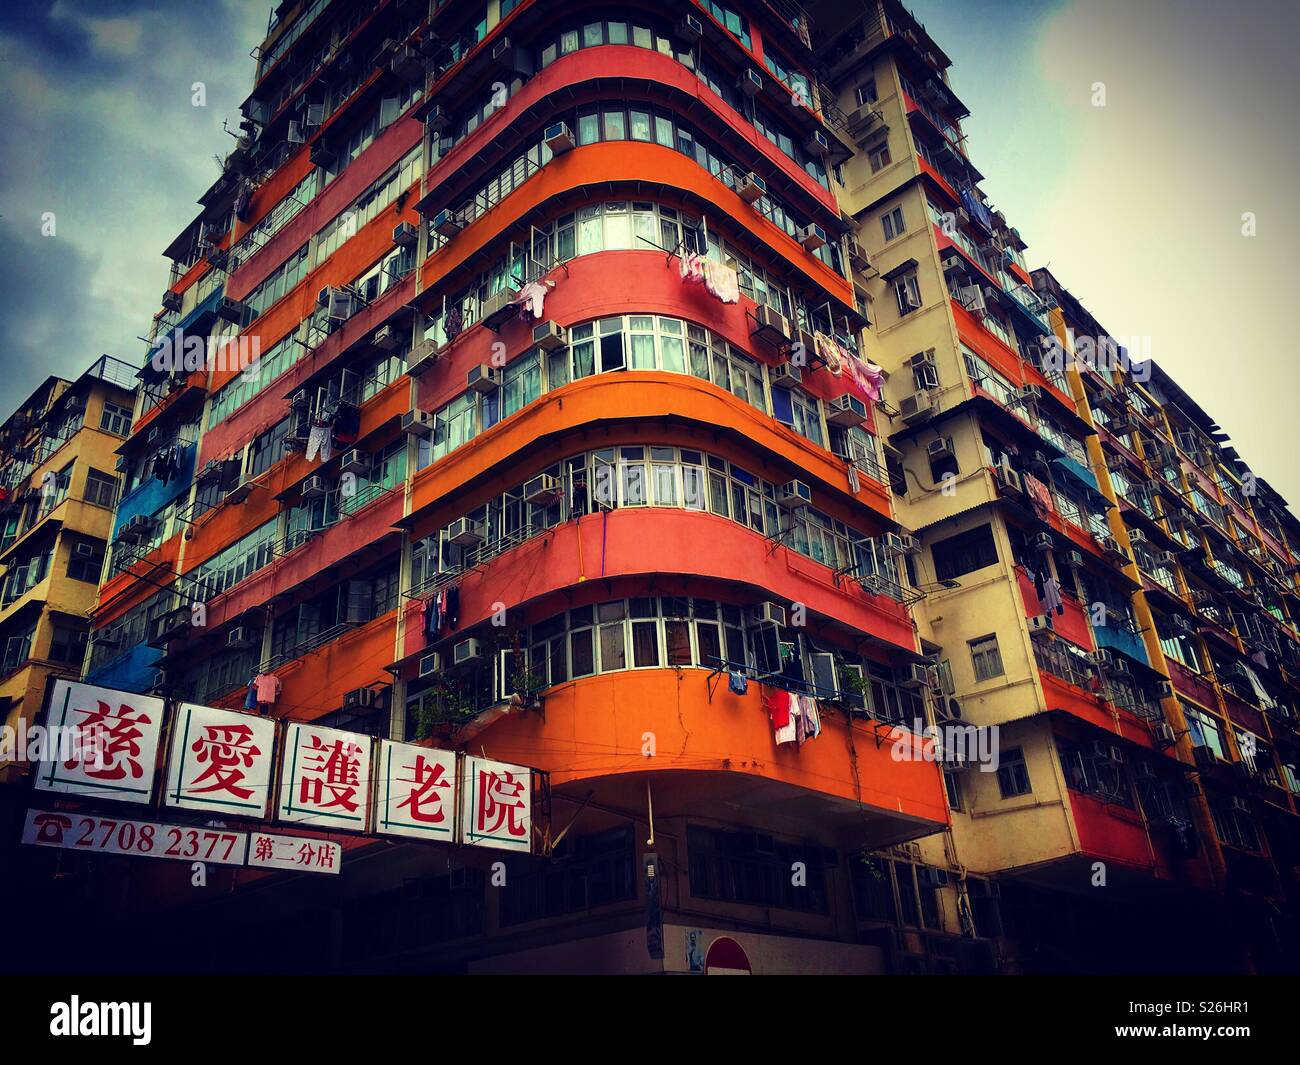 Hong Kong. Lado de Kowloon. Mongkok área con su viejo edificio torre típica Imagen De Stock